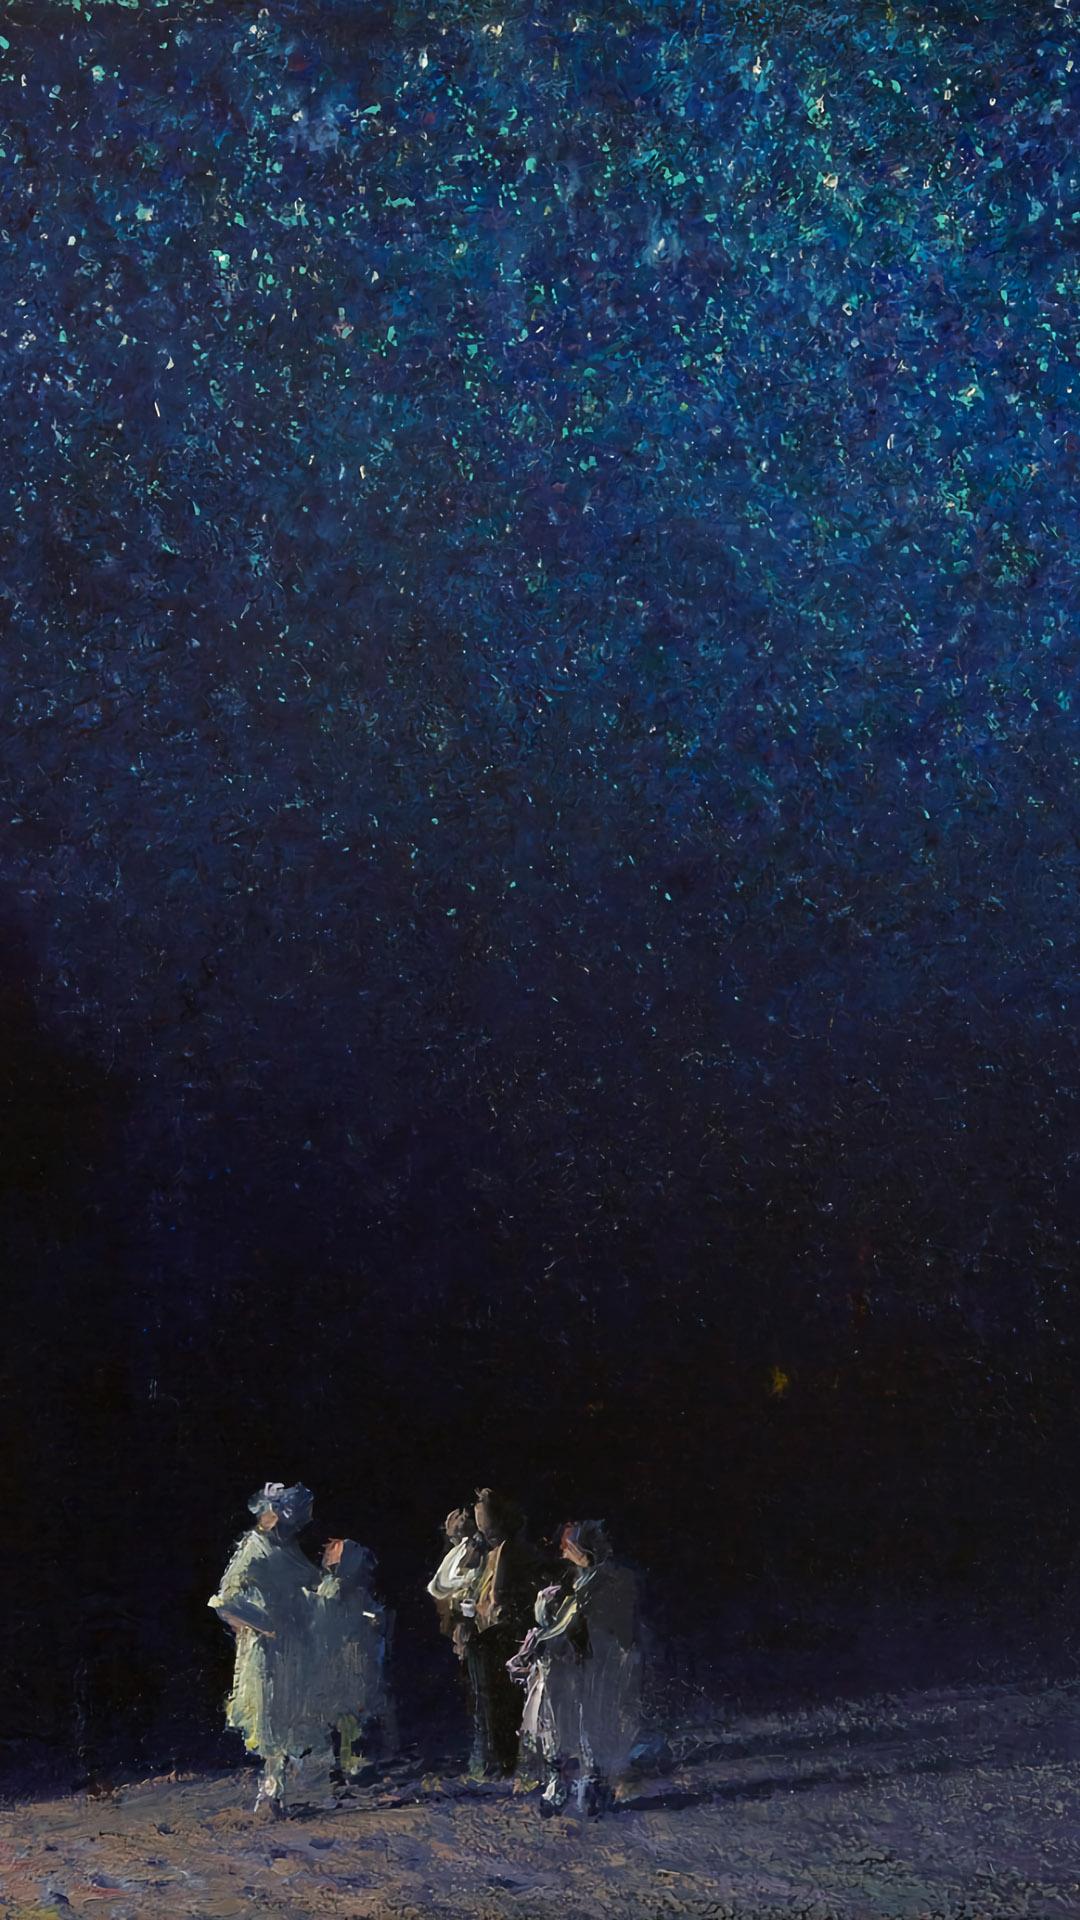 Edward Potthast - Starry Night 1080x1920